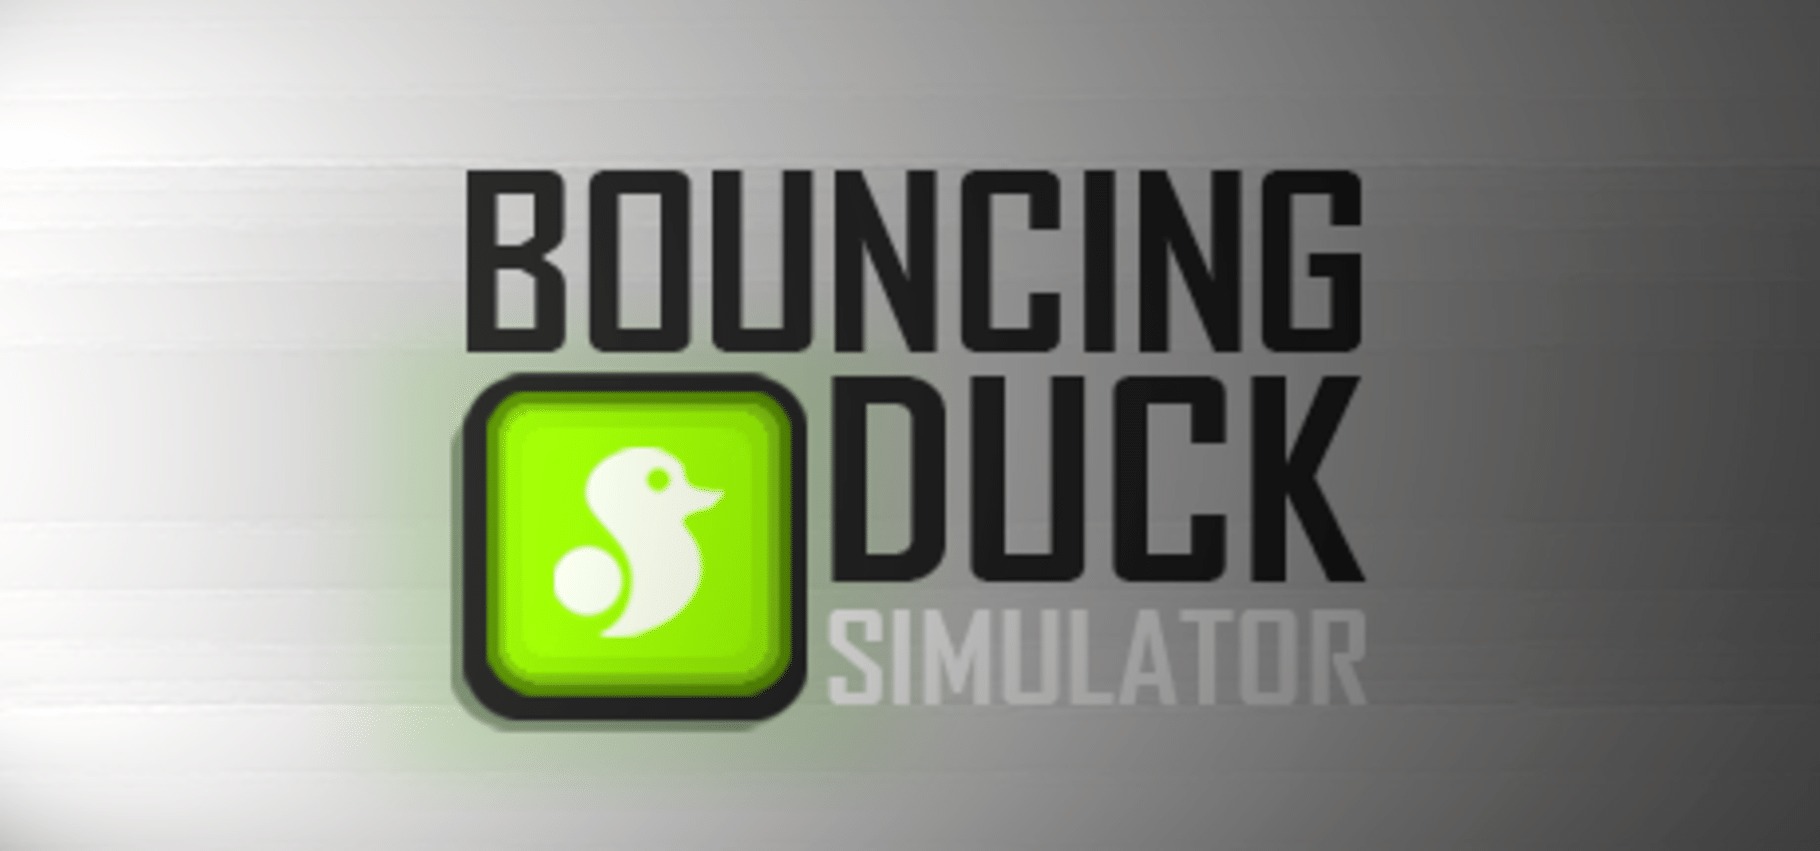 buy Bouncing Duck Simulator cd key for psn platform